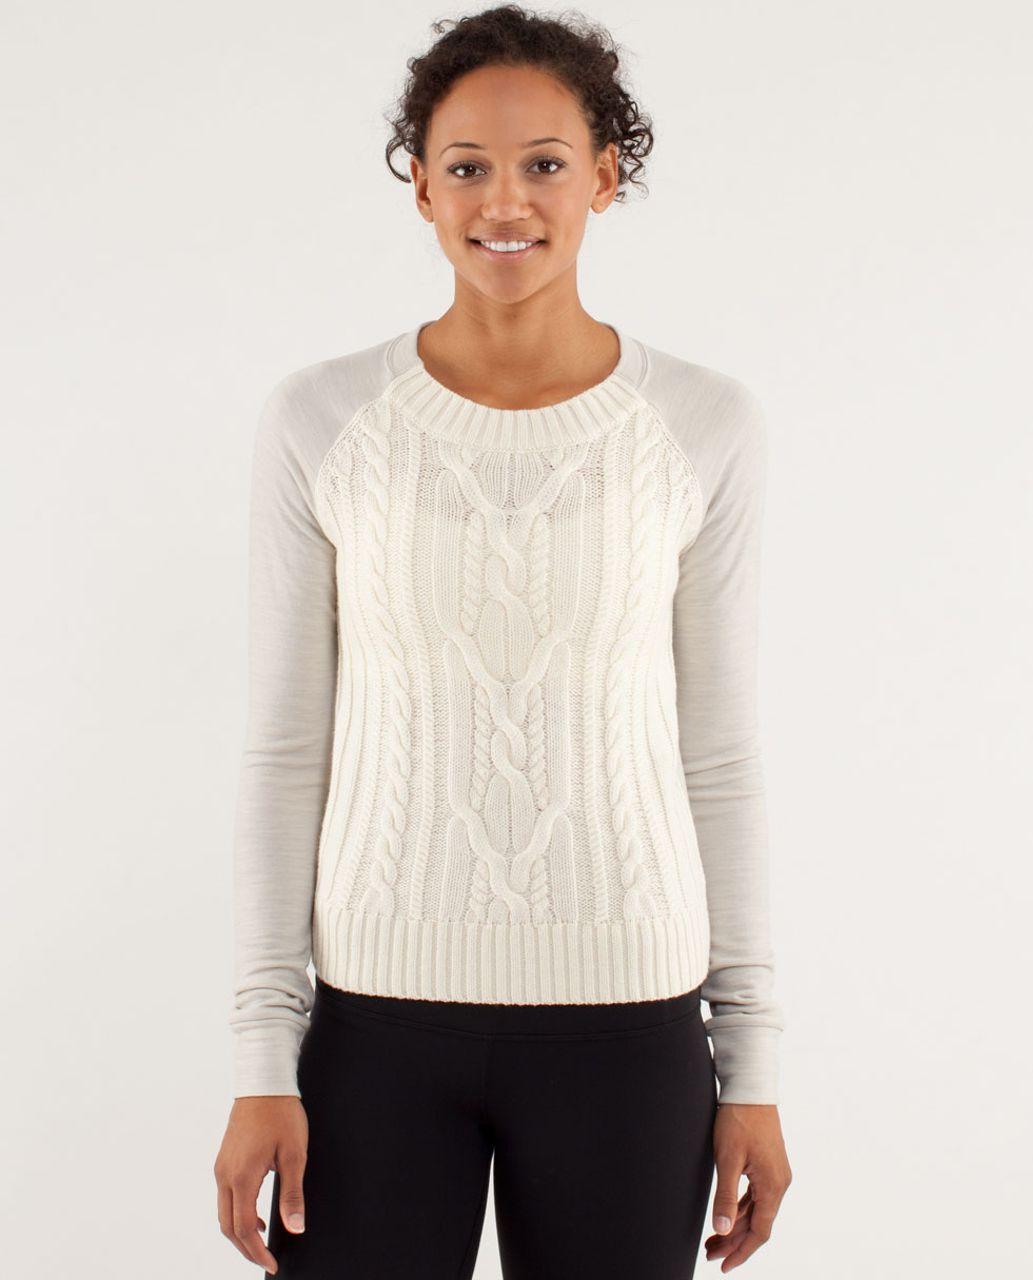 Lululemon St Moritz Sweater - Polar Cream - lulu fanatics